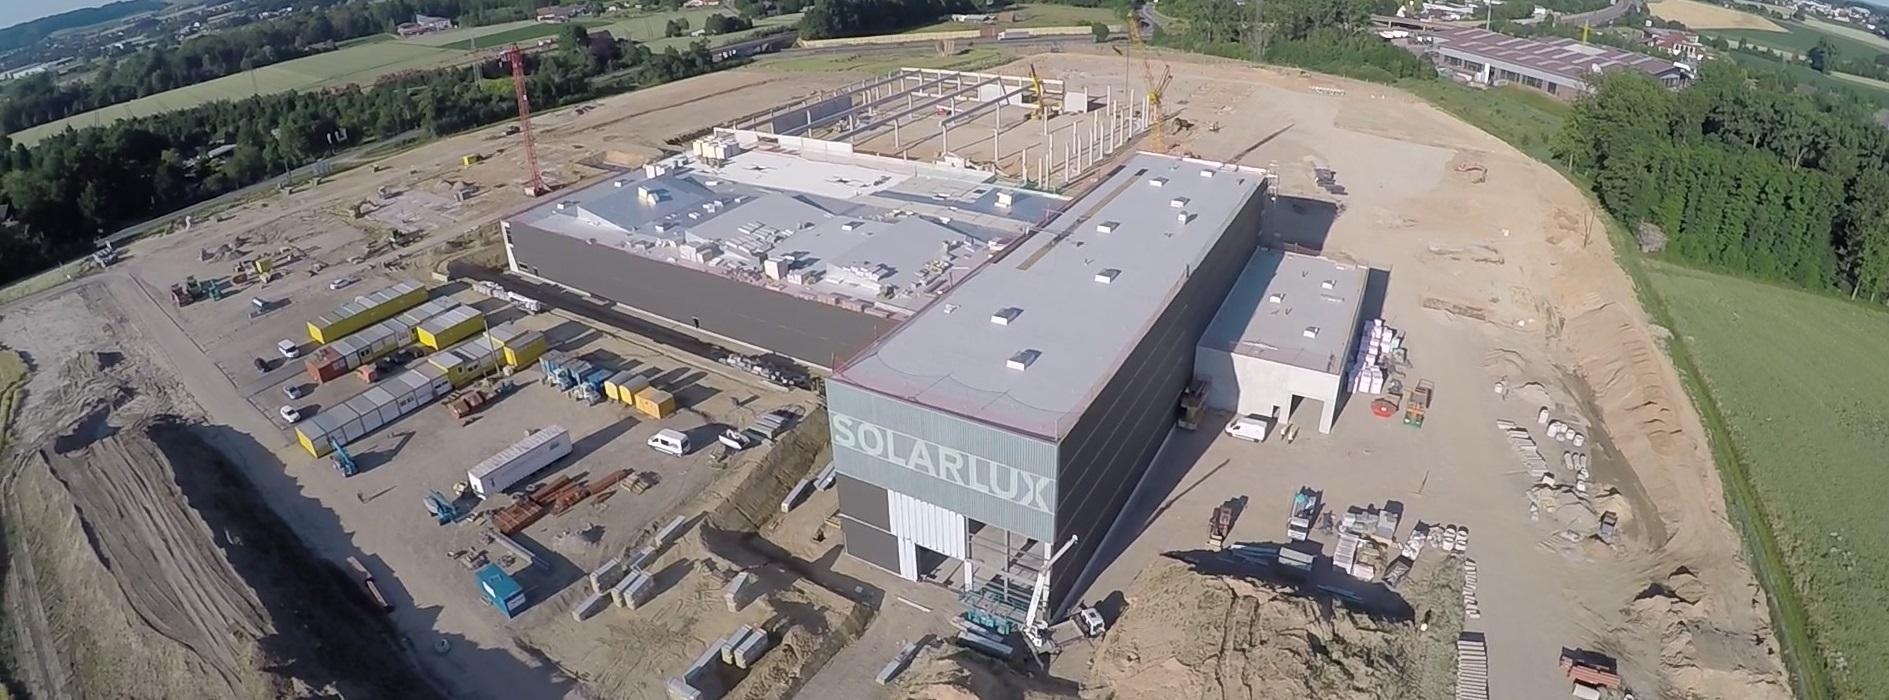 Solarlux Melle dia179